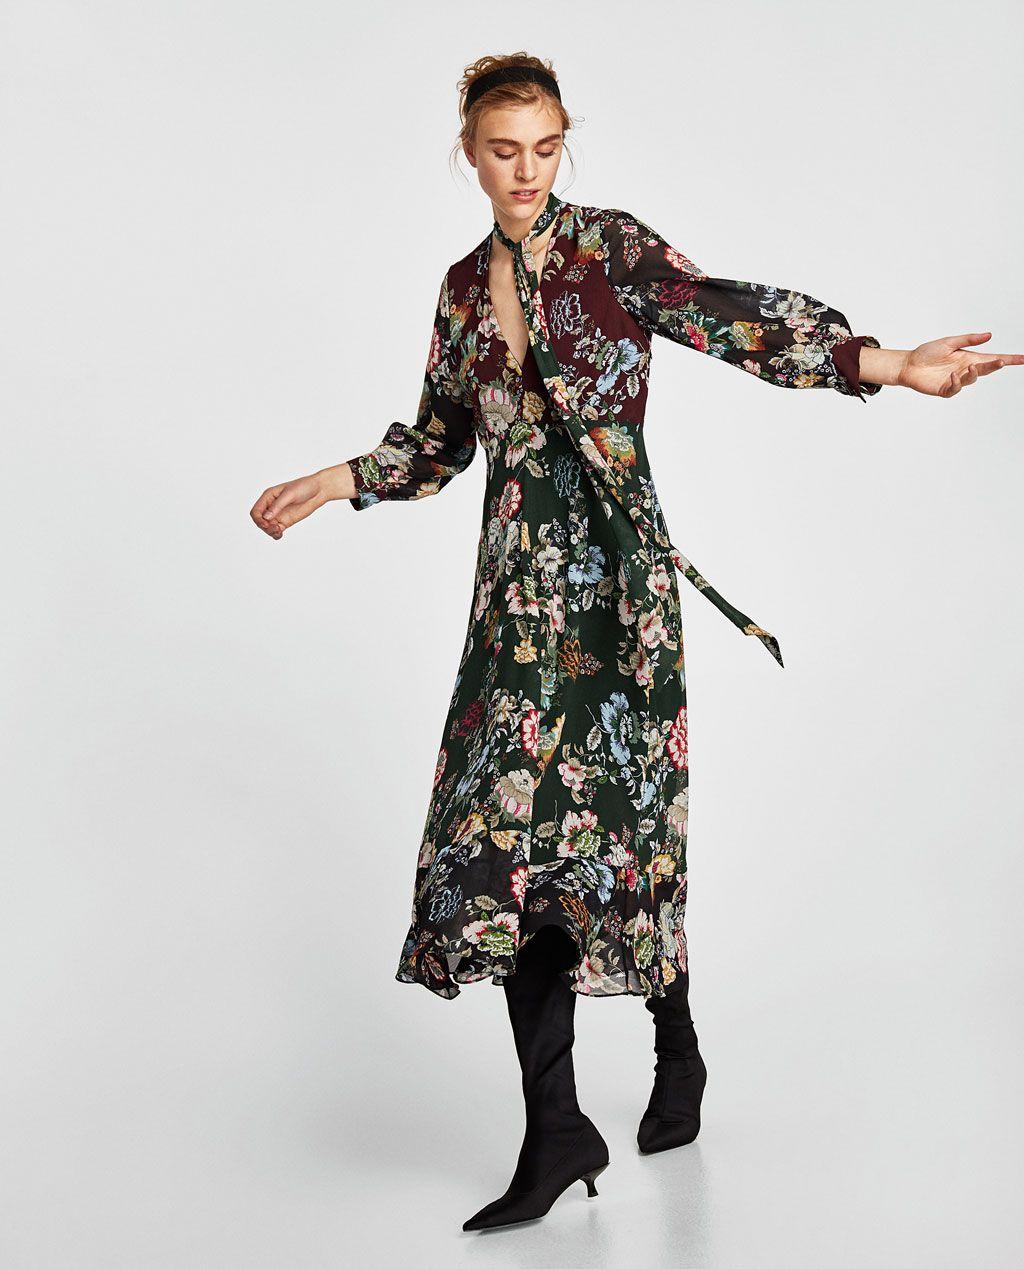 Long Waist Dress Image Printed Zara Empire From 1 Of Flowing n8wXON0Pk